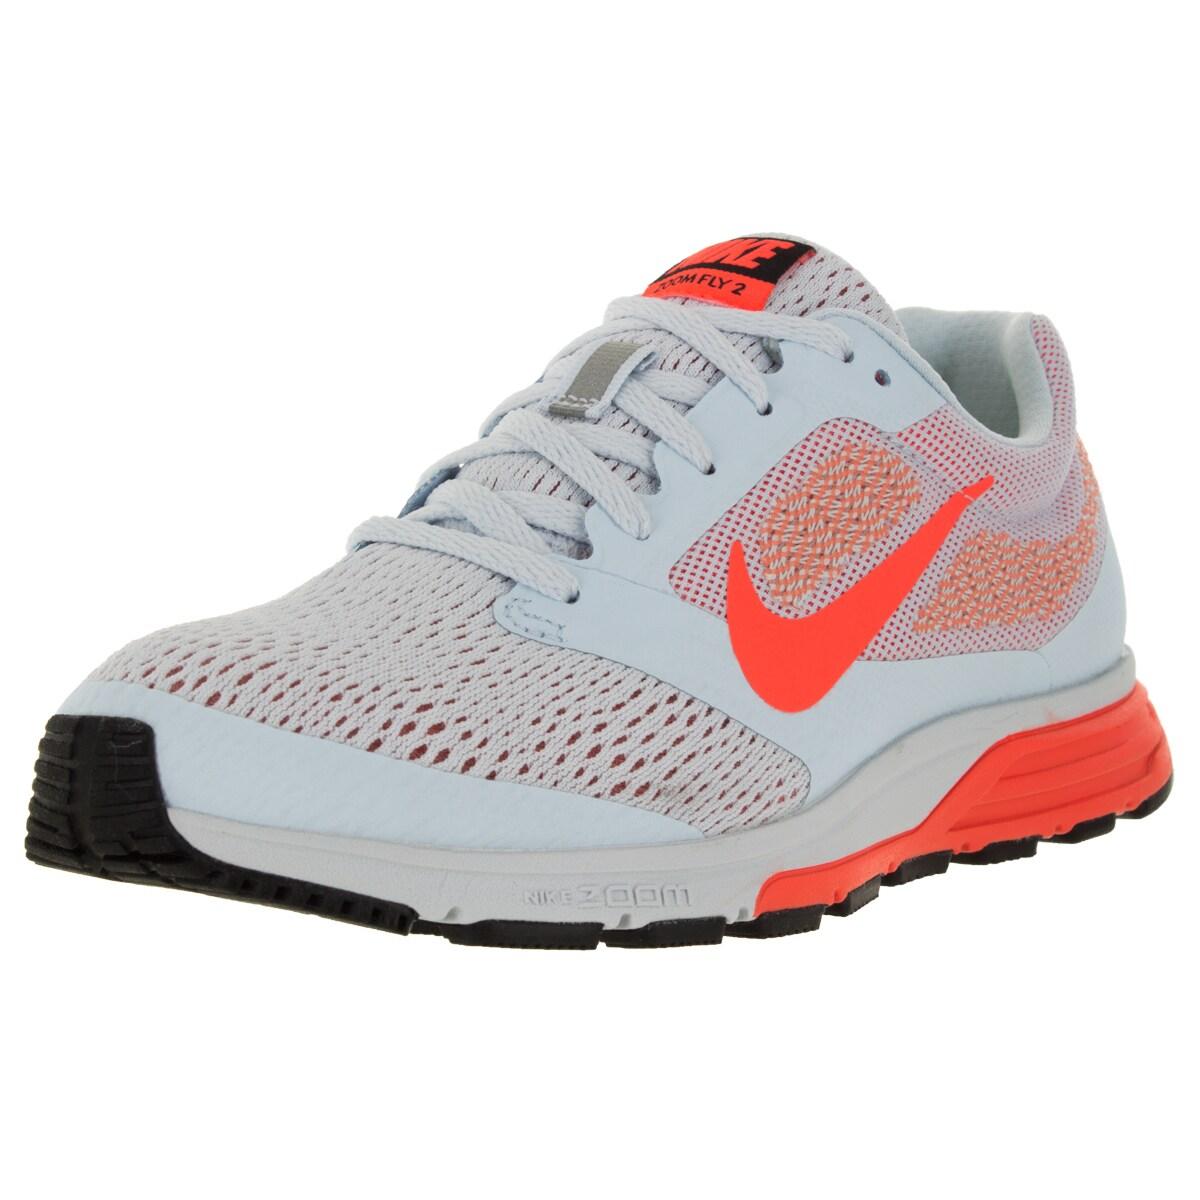 1e2f7a037a3bf Shop Nike Women s Air Zoom Fly 2 Blue Tint  Orange Atmc Pink Running Shoe -  Free Shipping Today - Overstock - 12321716